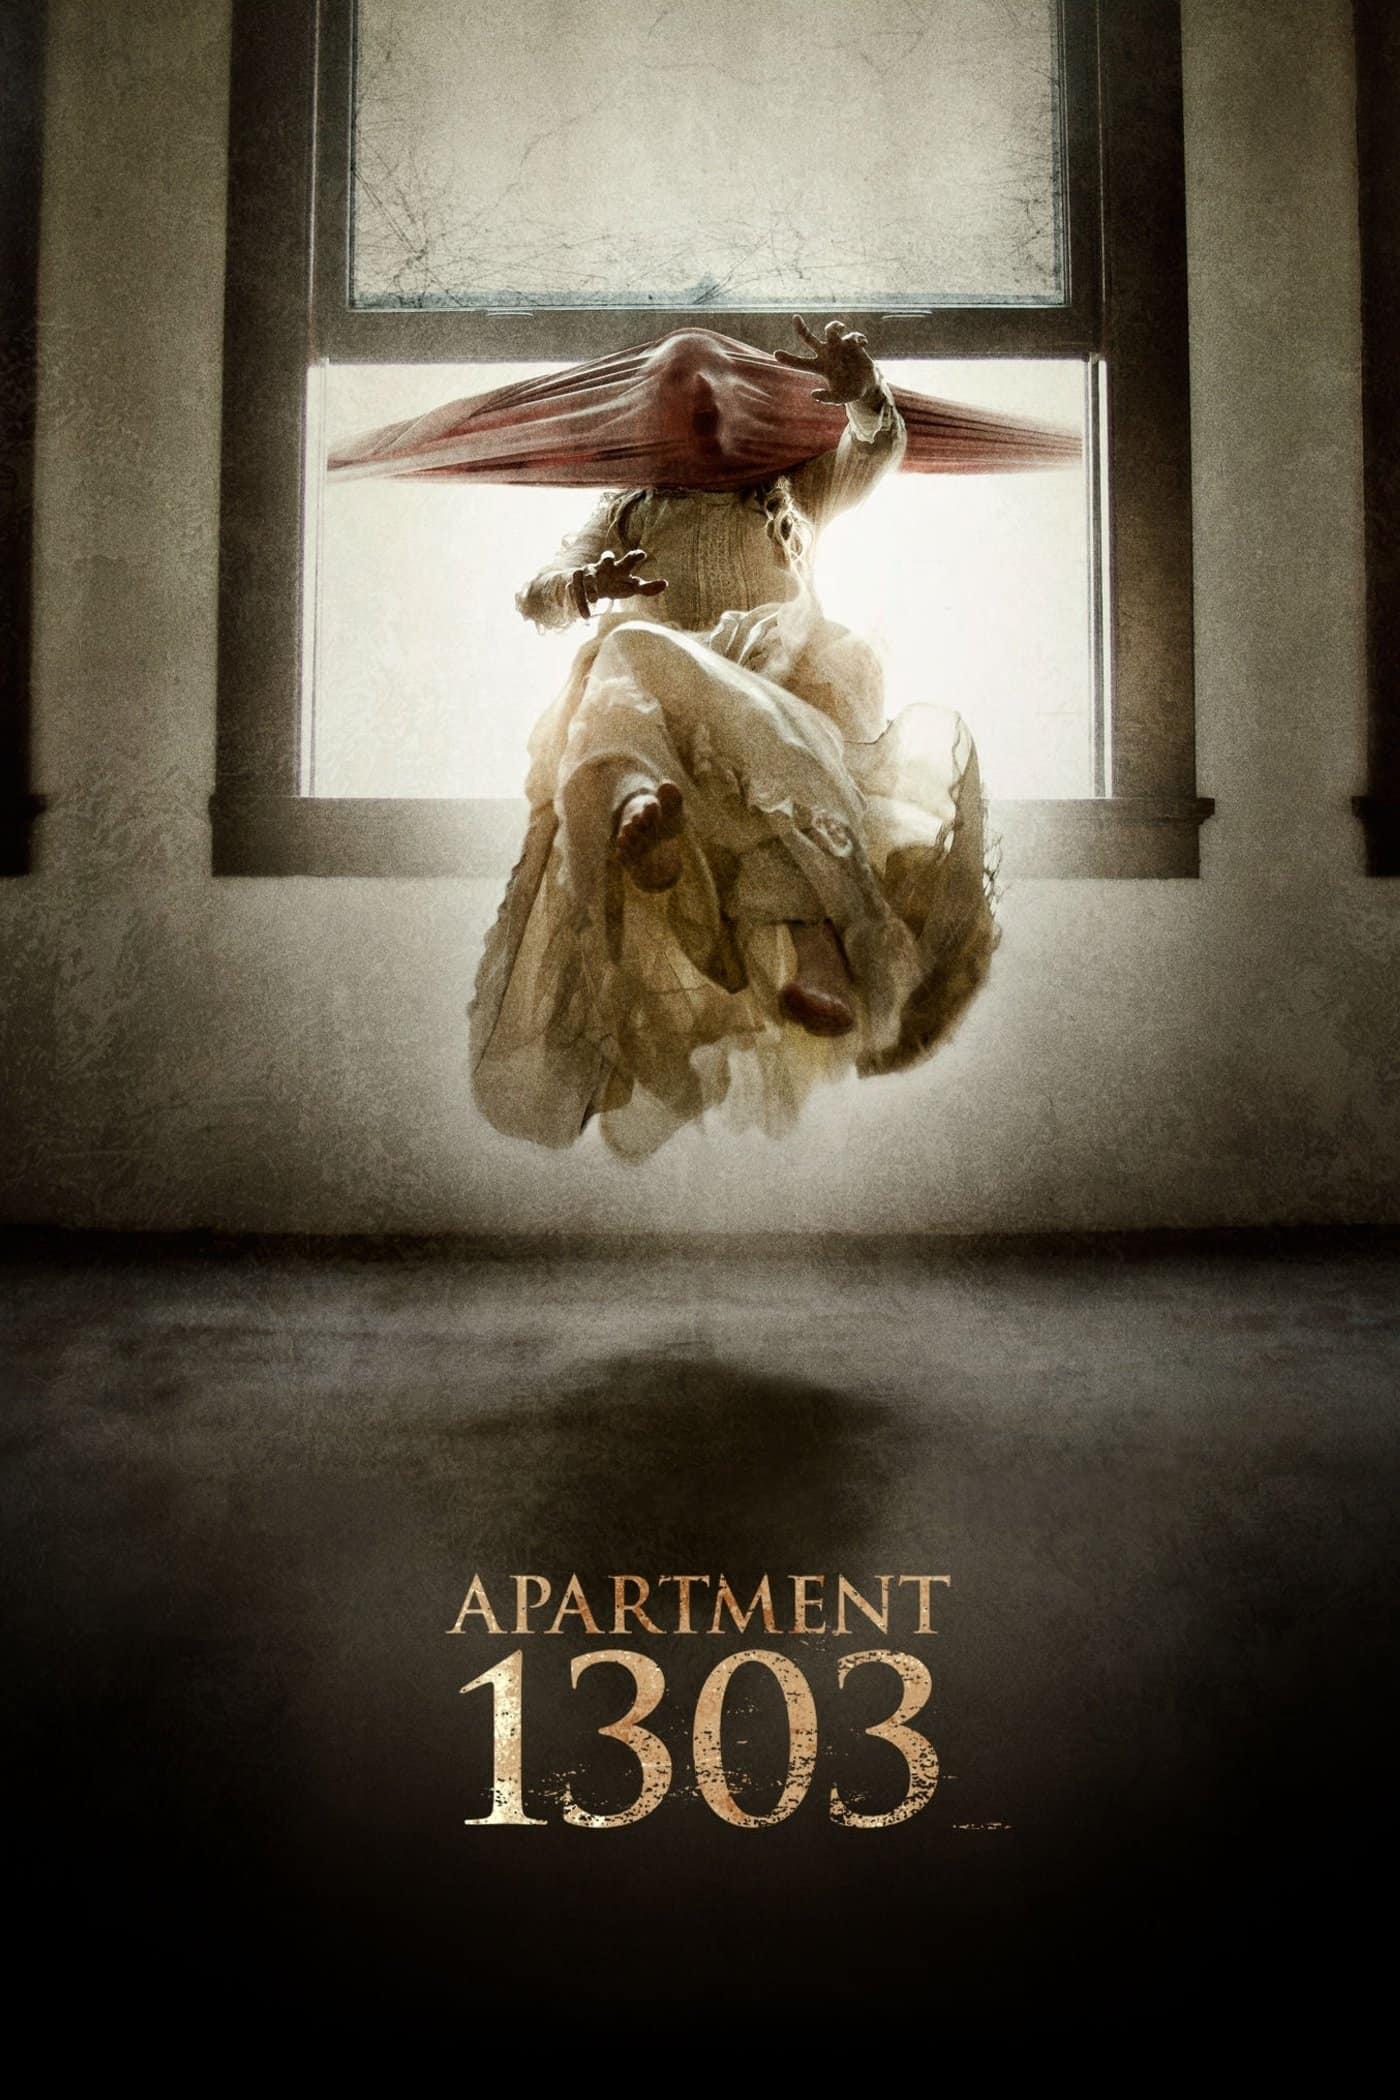 Apartment 1303 3D, 2012